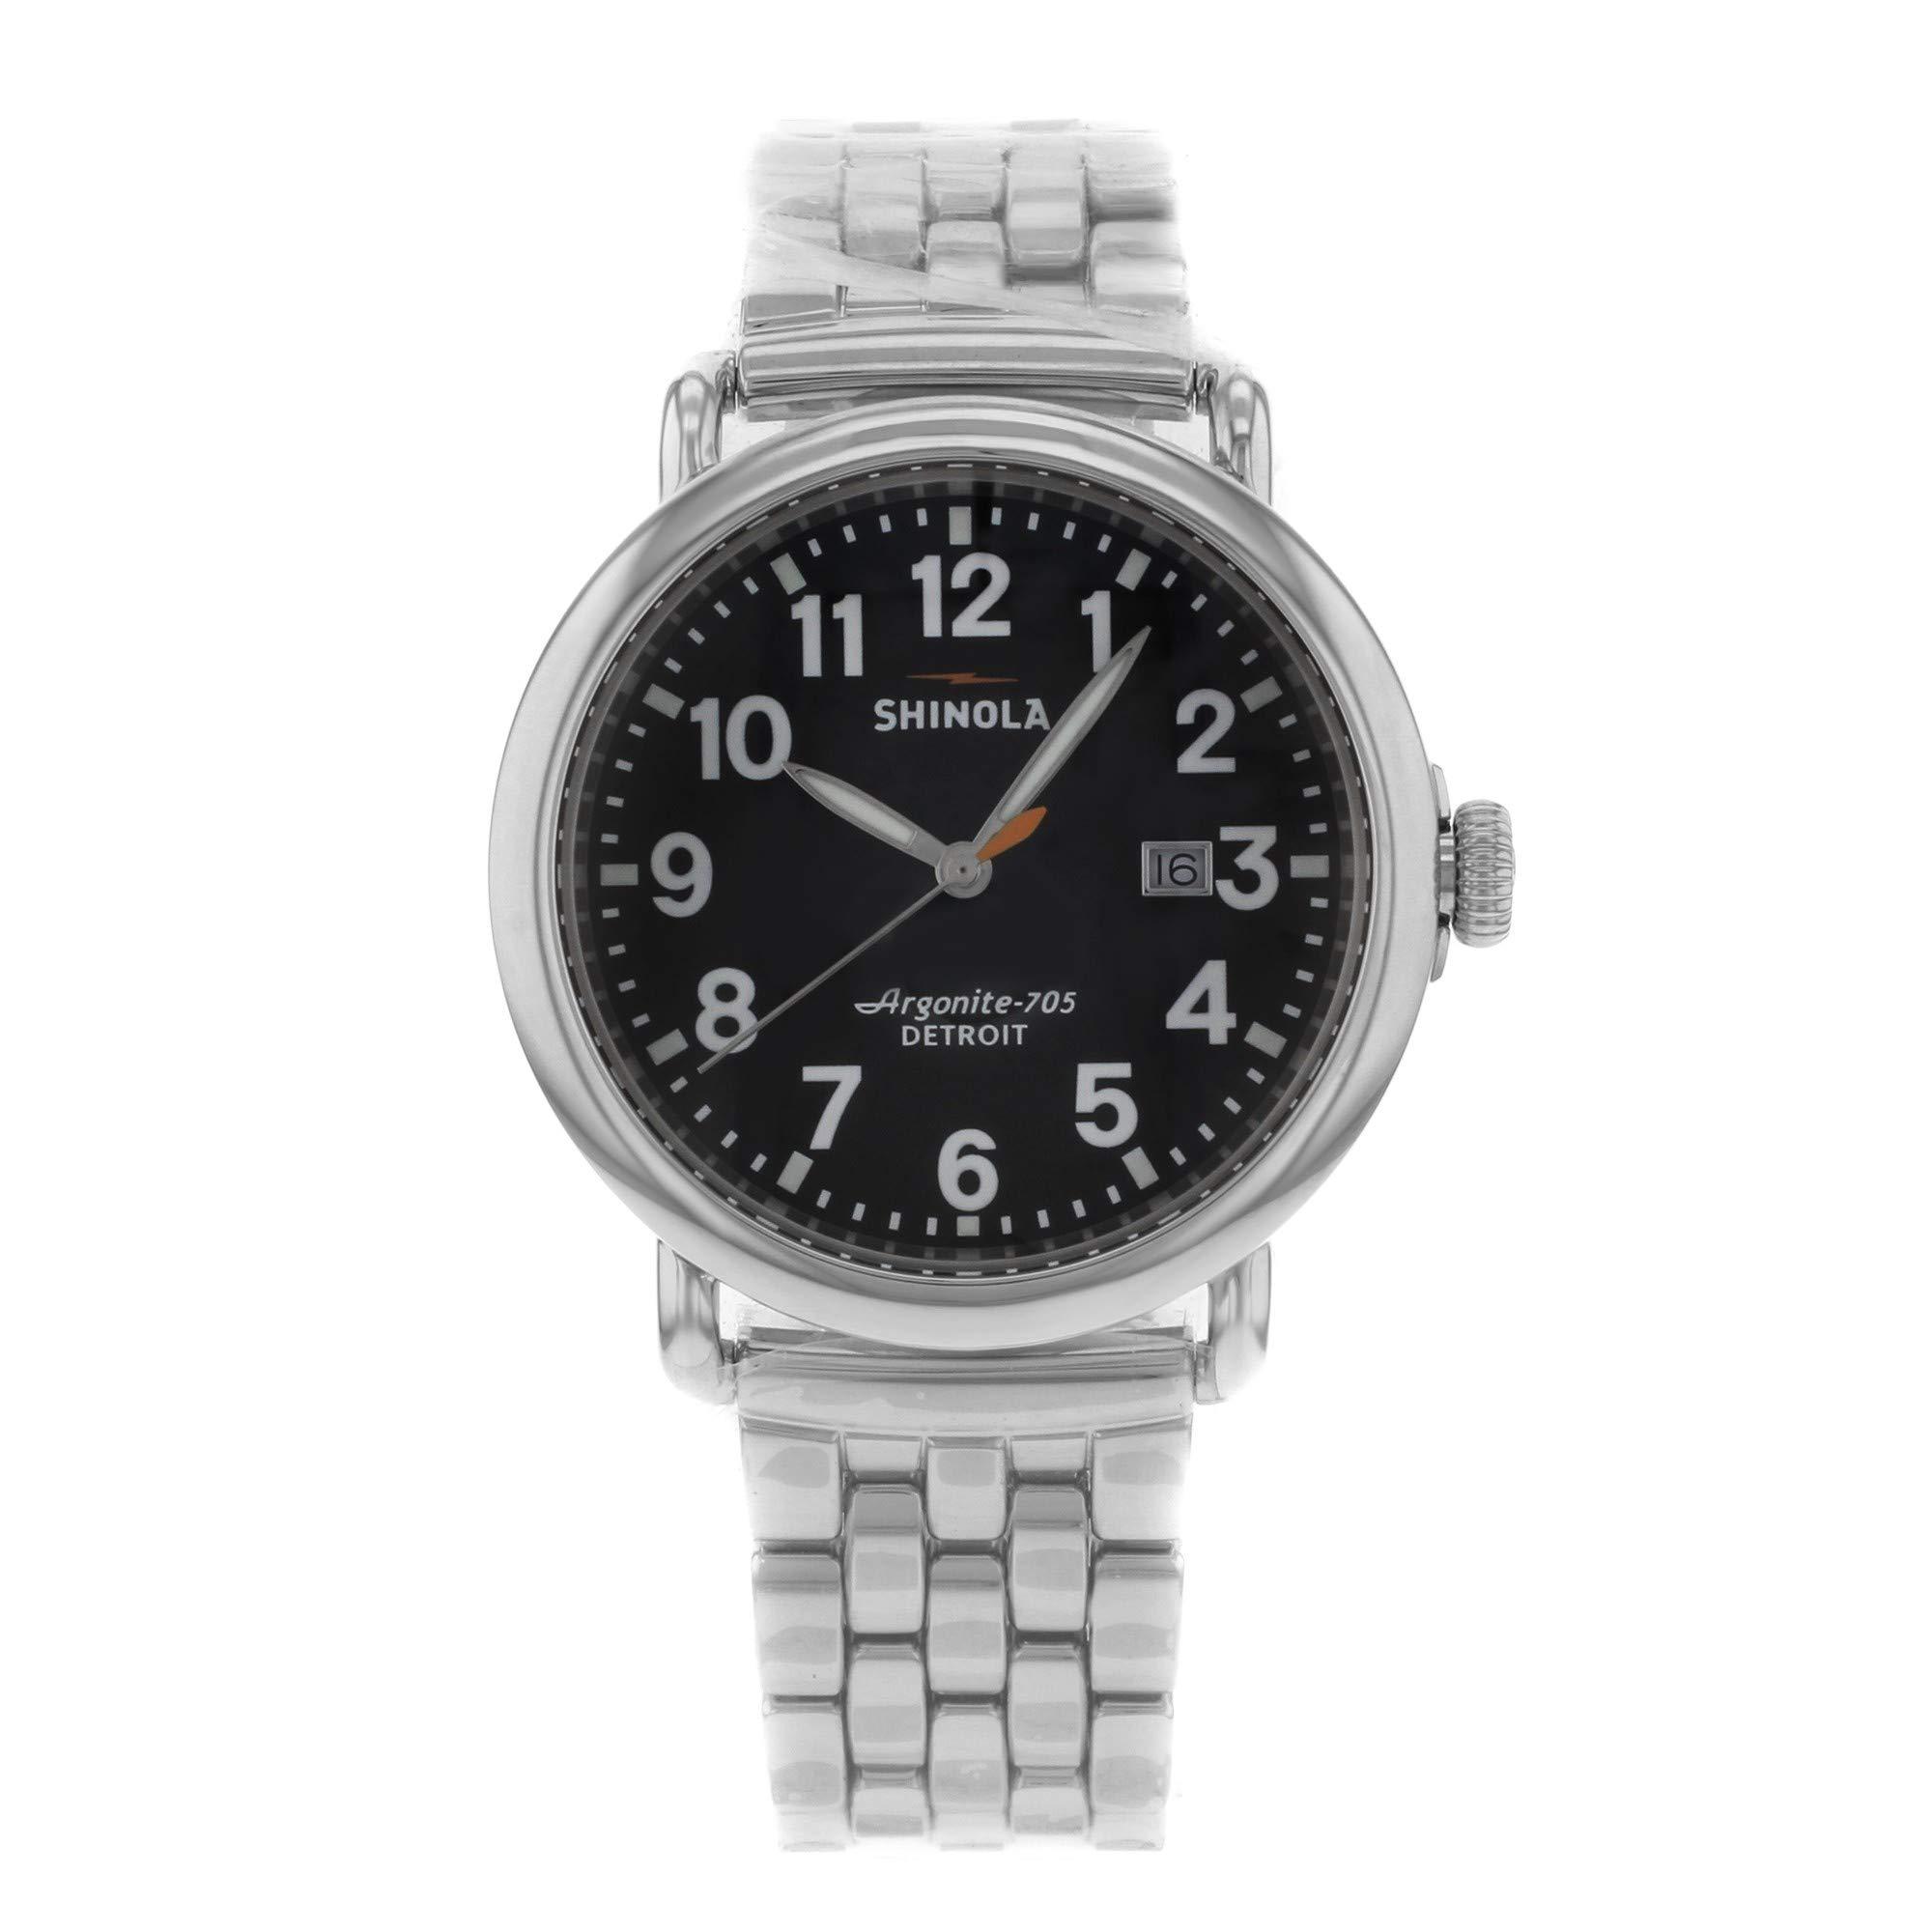 Shinola The Runwell Quartz Male Watch 10000053 (Certified Pre-Owned) by Shinola